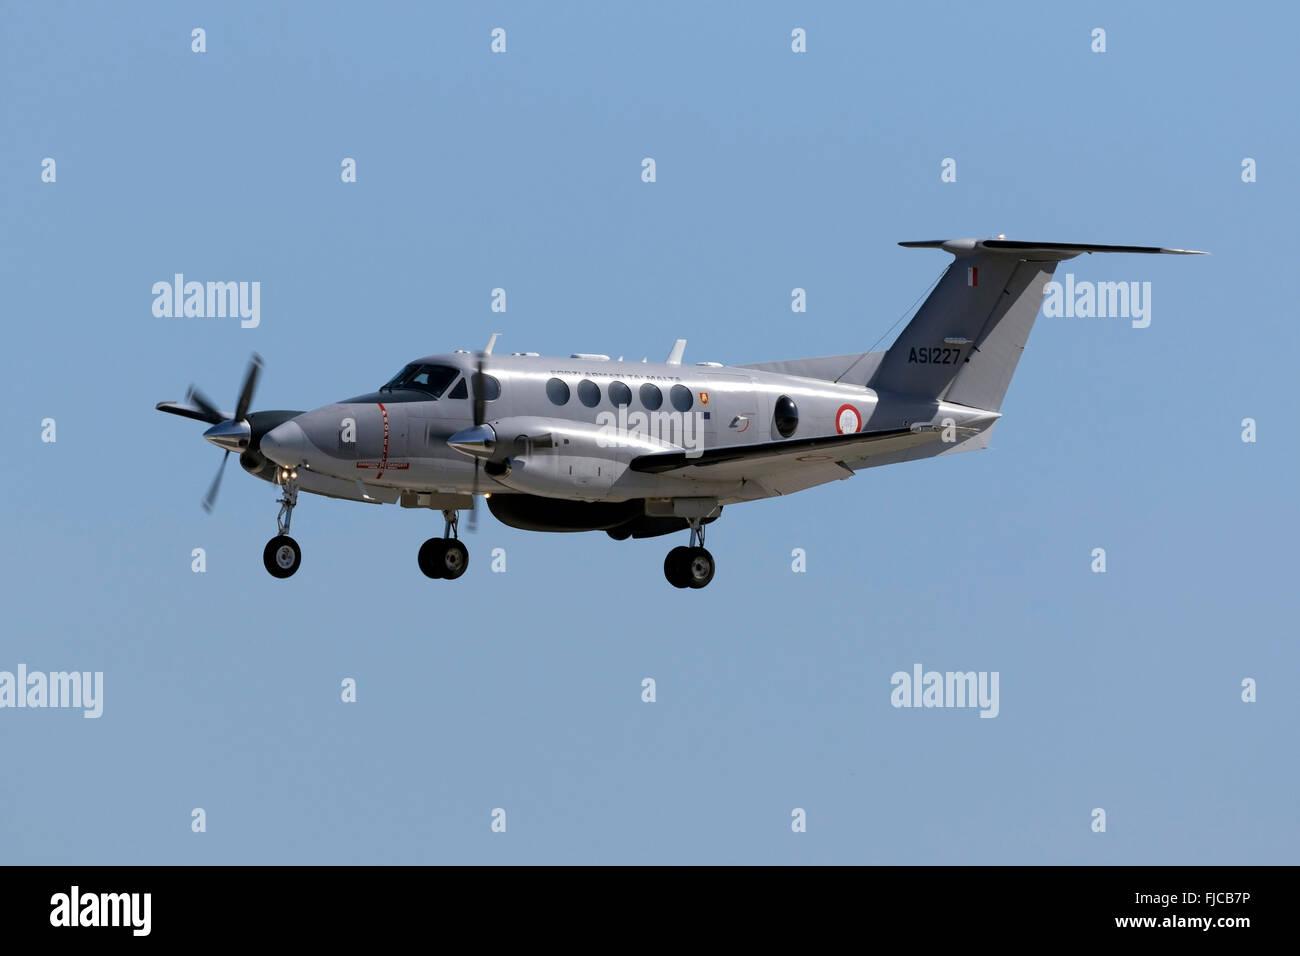 Maltese Armed Force Kingair 200 maritime patrol aircraft. - Stock Image